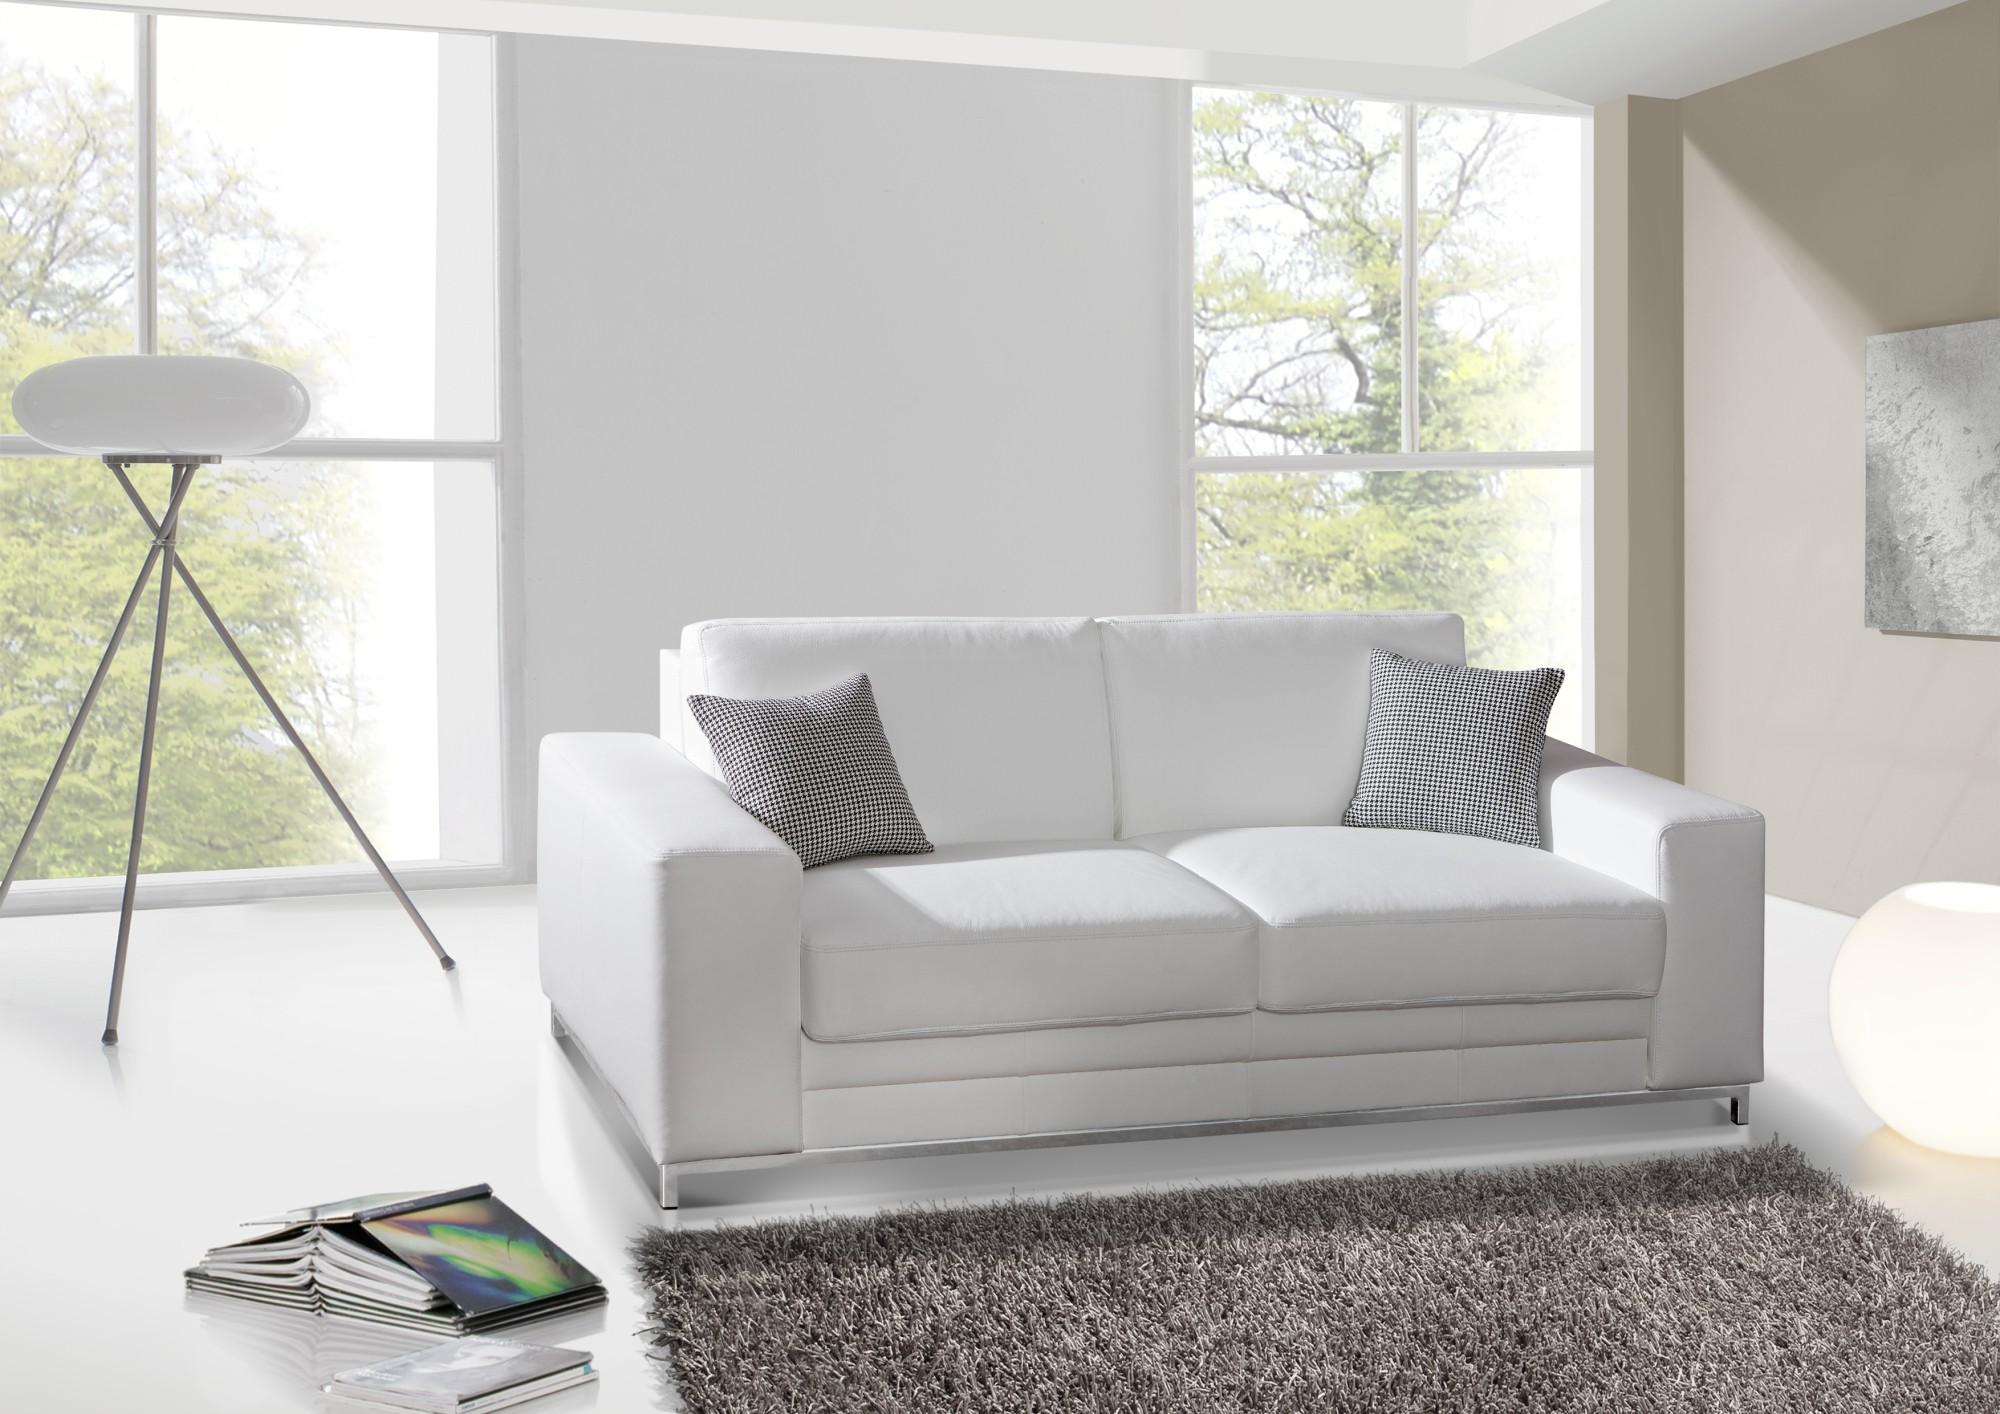 schlafsofa chloe lf 130 cm von restyl. Black Bedroom Furniture Sets. Home Design Ideas